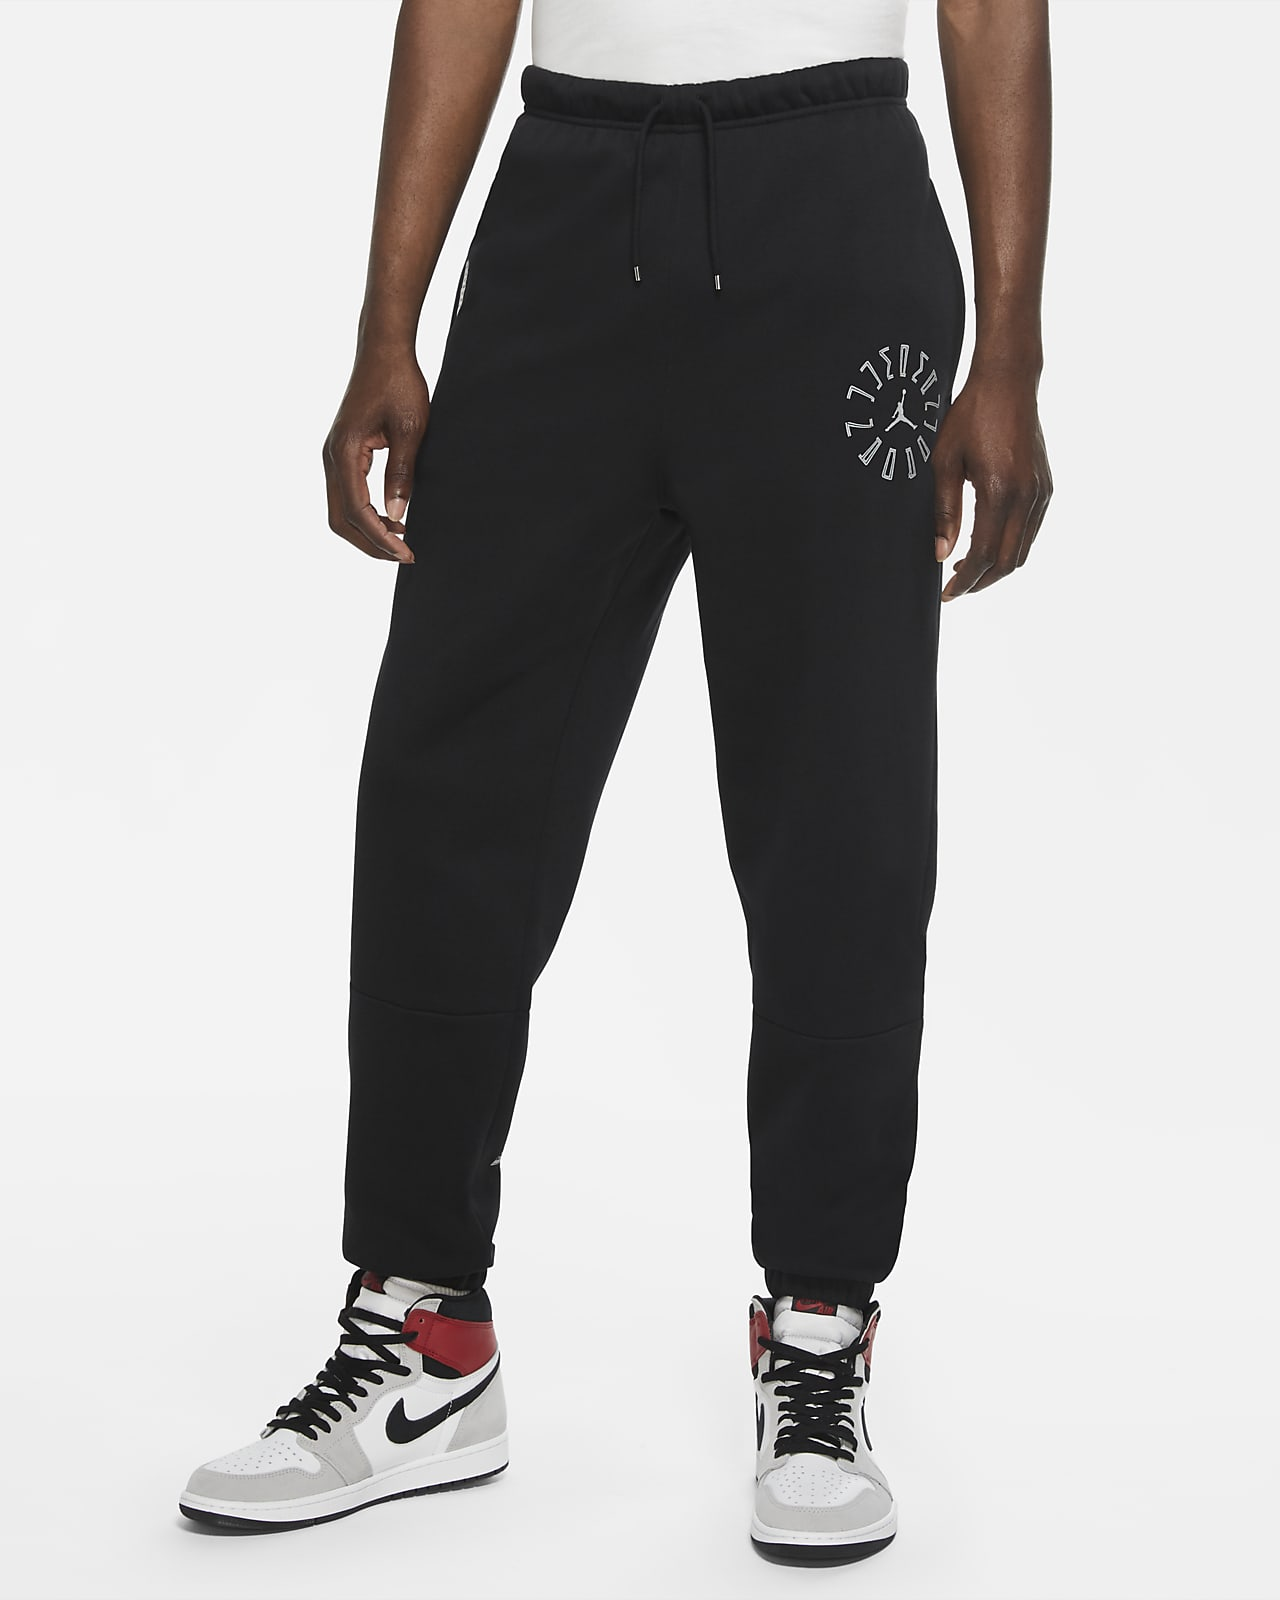 Jordan AJ11 Graphic Men's Fleece Pants